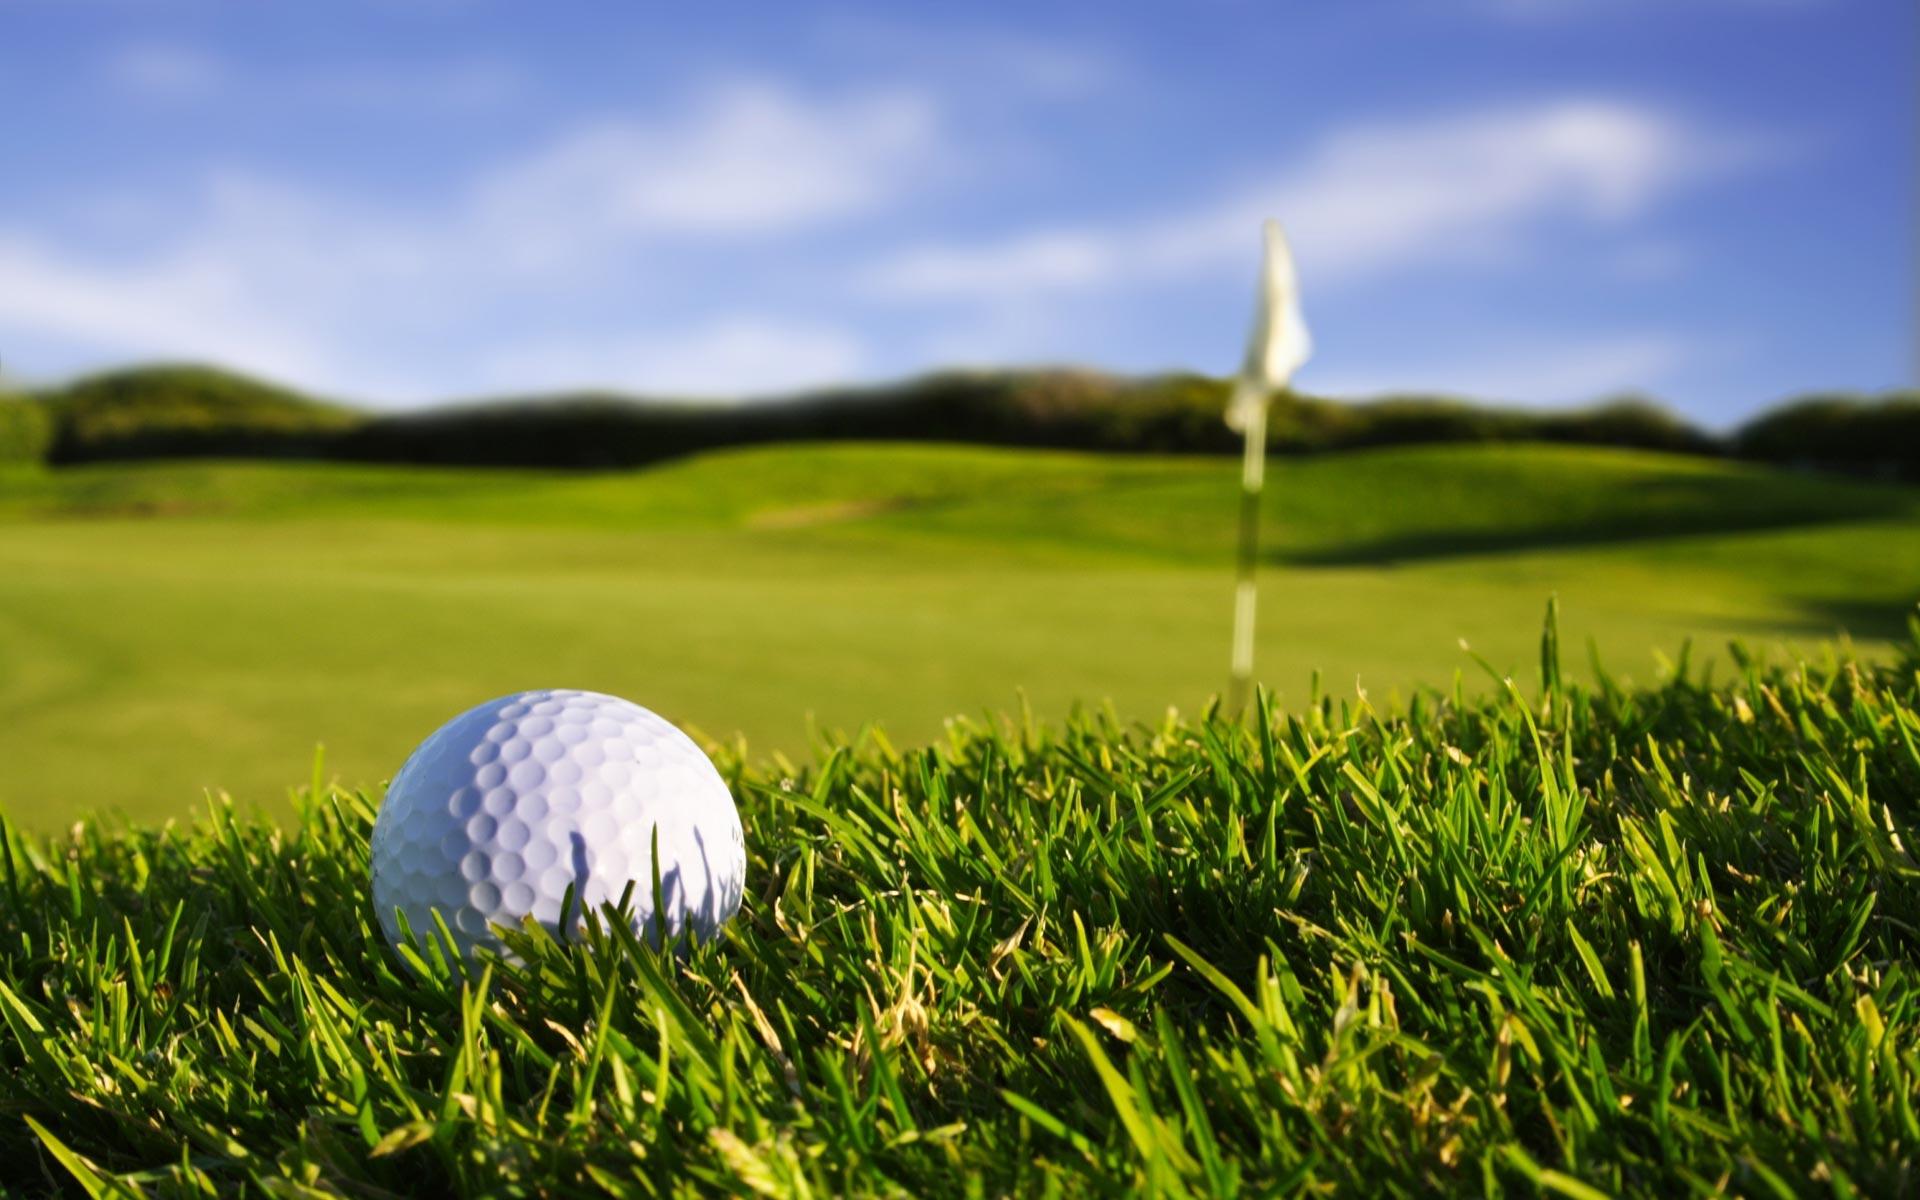 golf salvapantallas fondos de pantalla fondo wallpaper 1920x1200